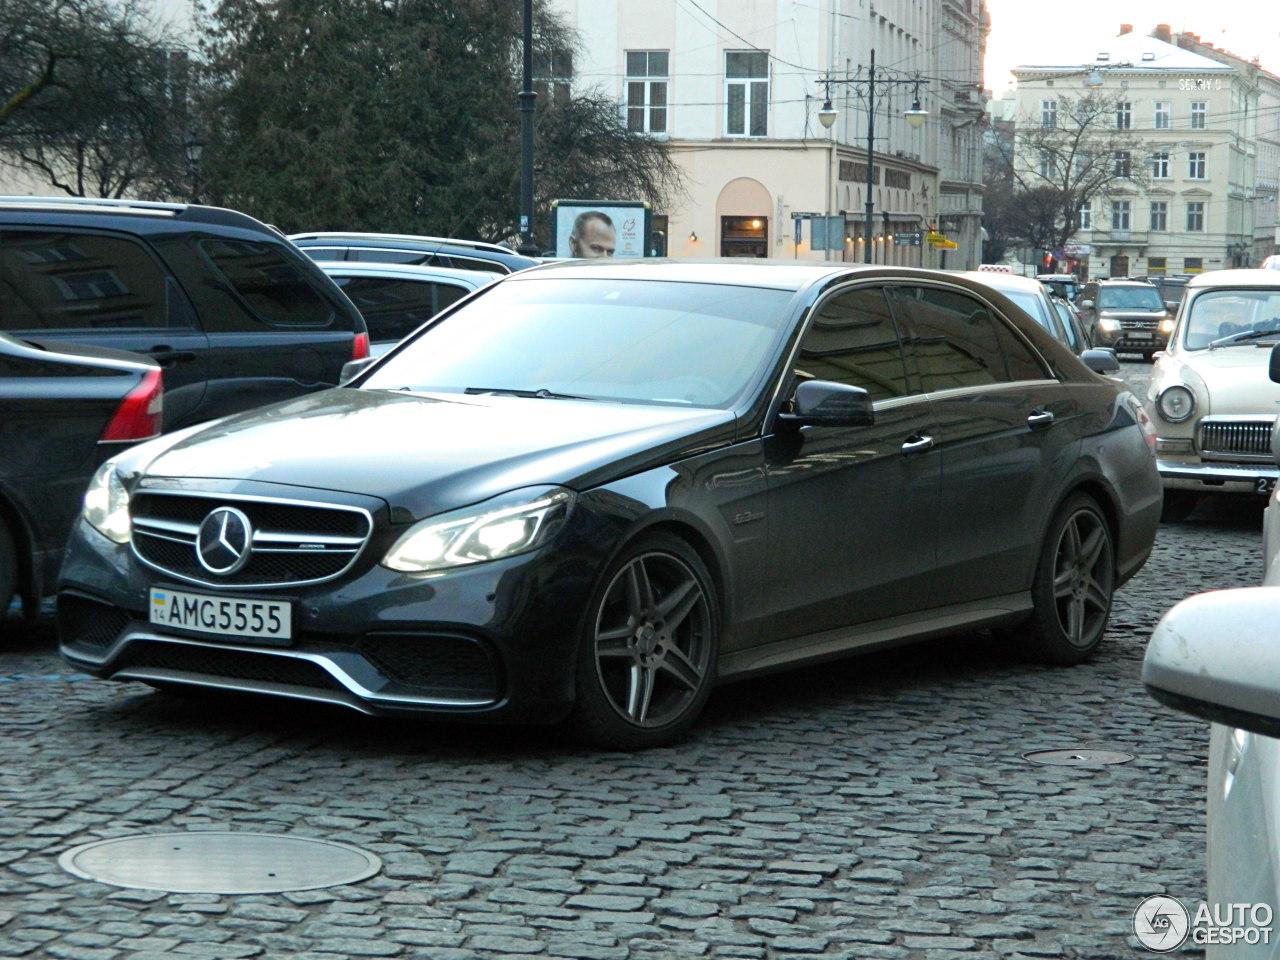 Mercedes Benz E 2017 Price >> Mercedes-Benz E 63 AMG W212 2013 - 5 January 2016 - Autogespot